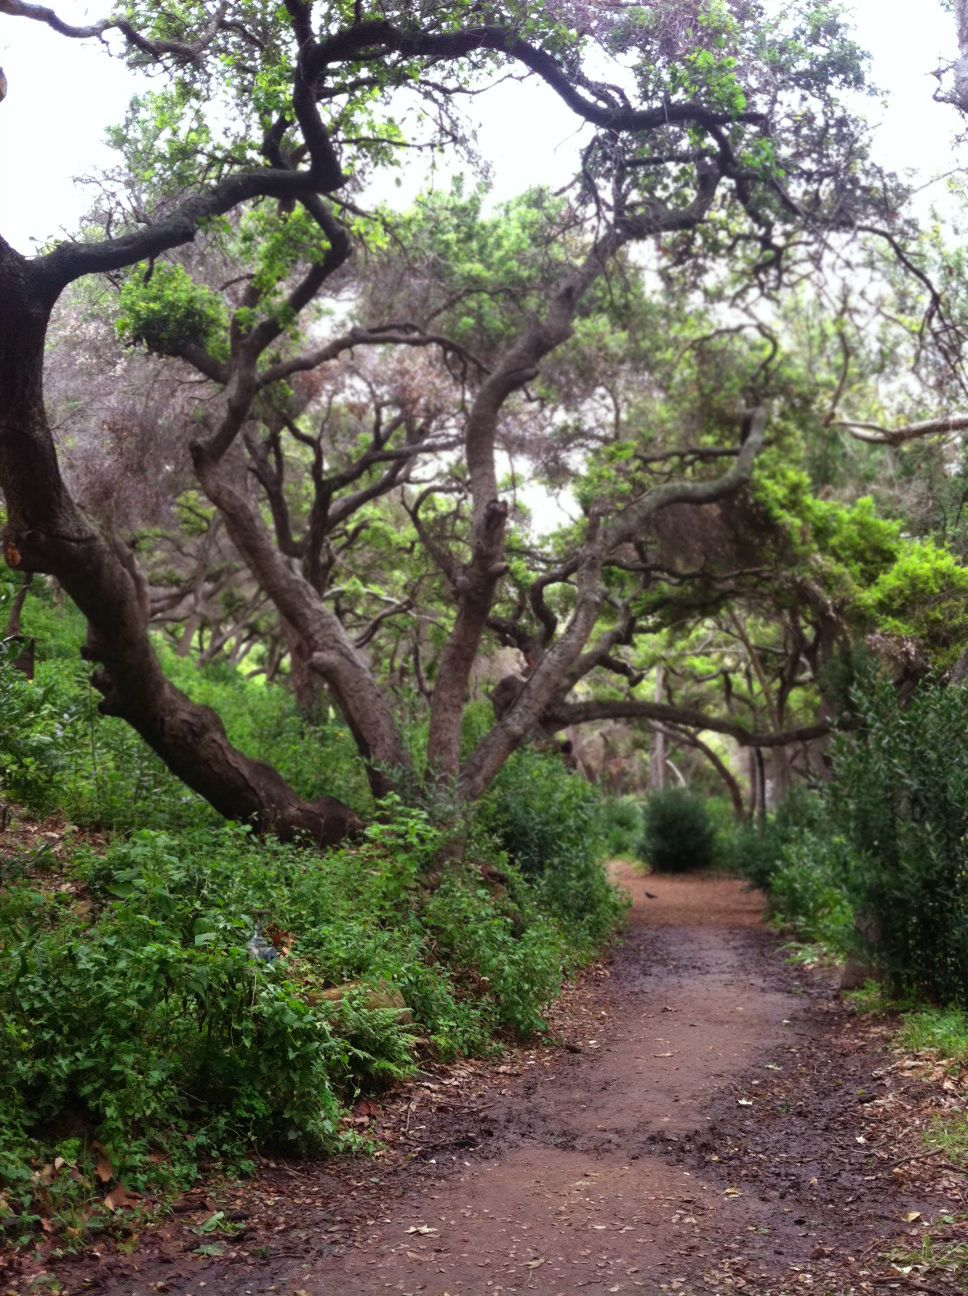 Santa Barbara Botanic Gardens